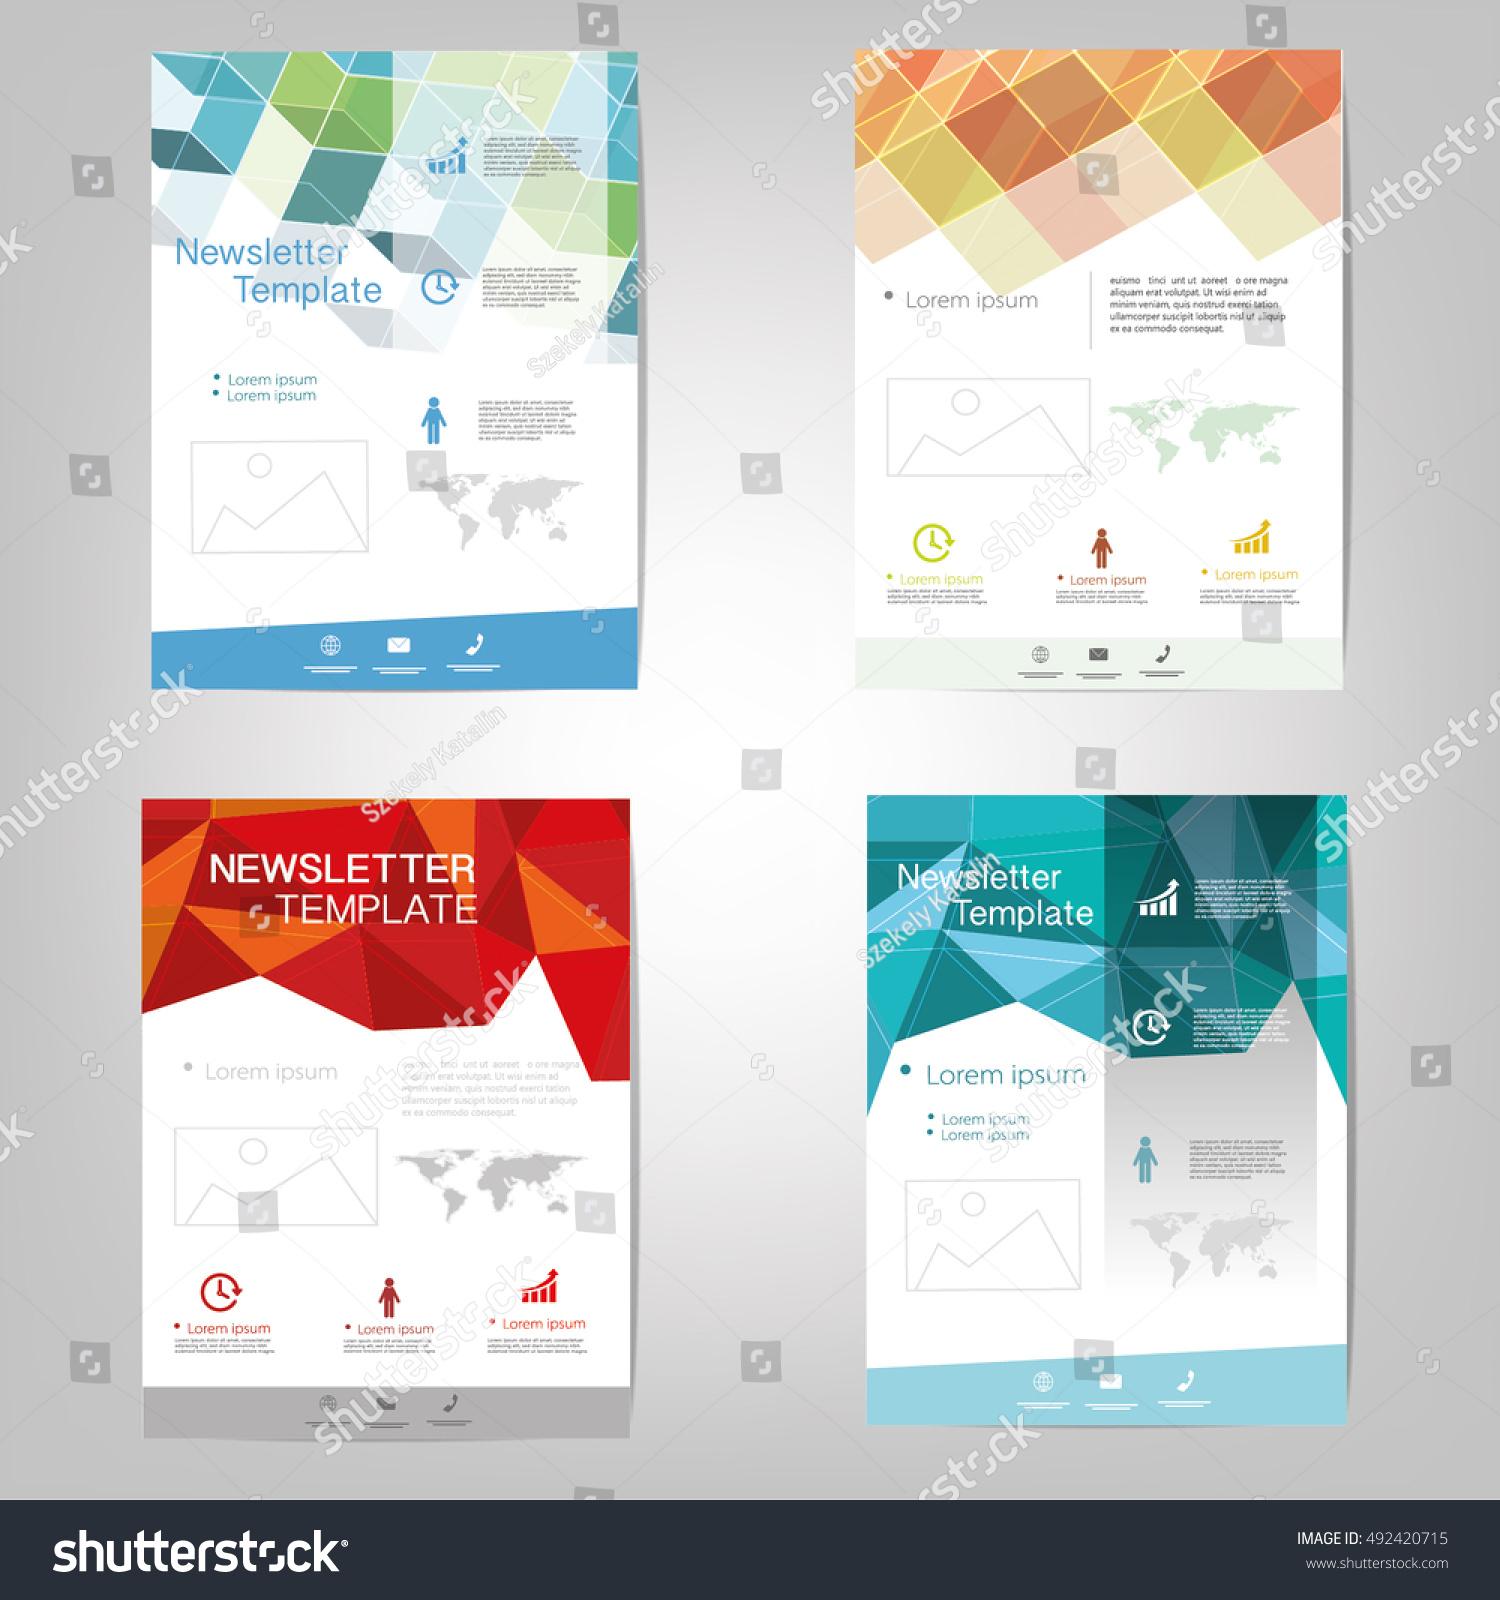 vector newsletter design templates stock vector royalty free